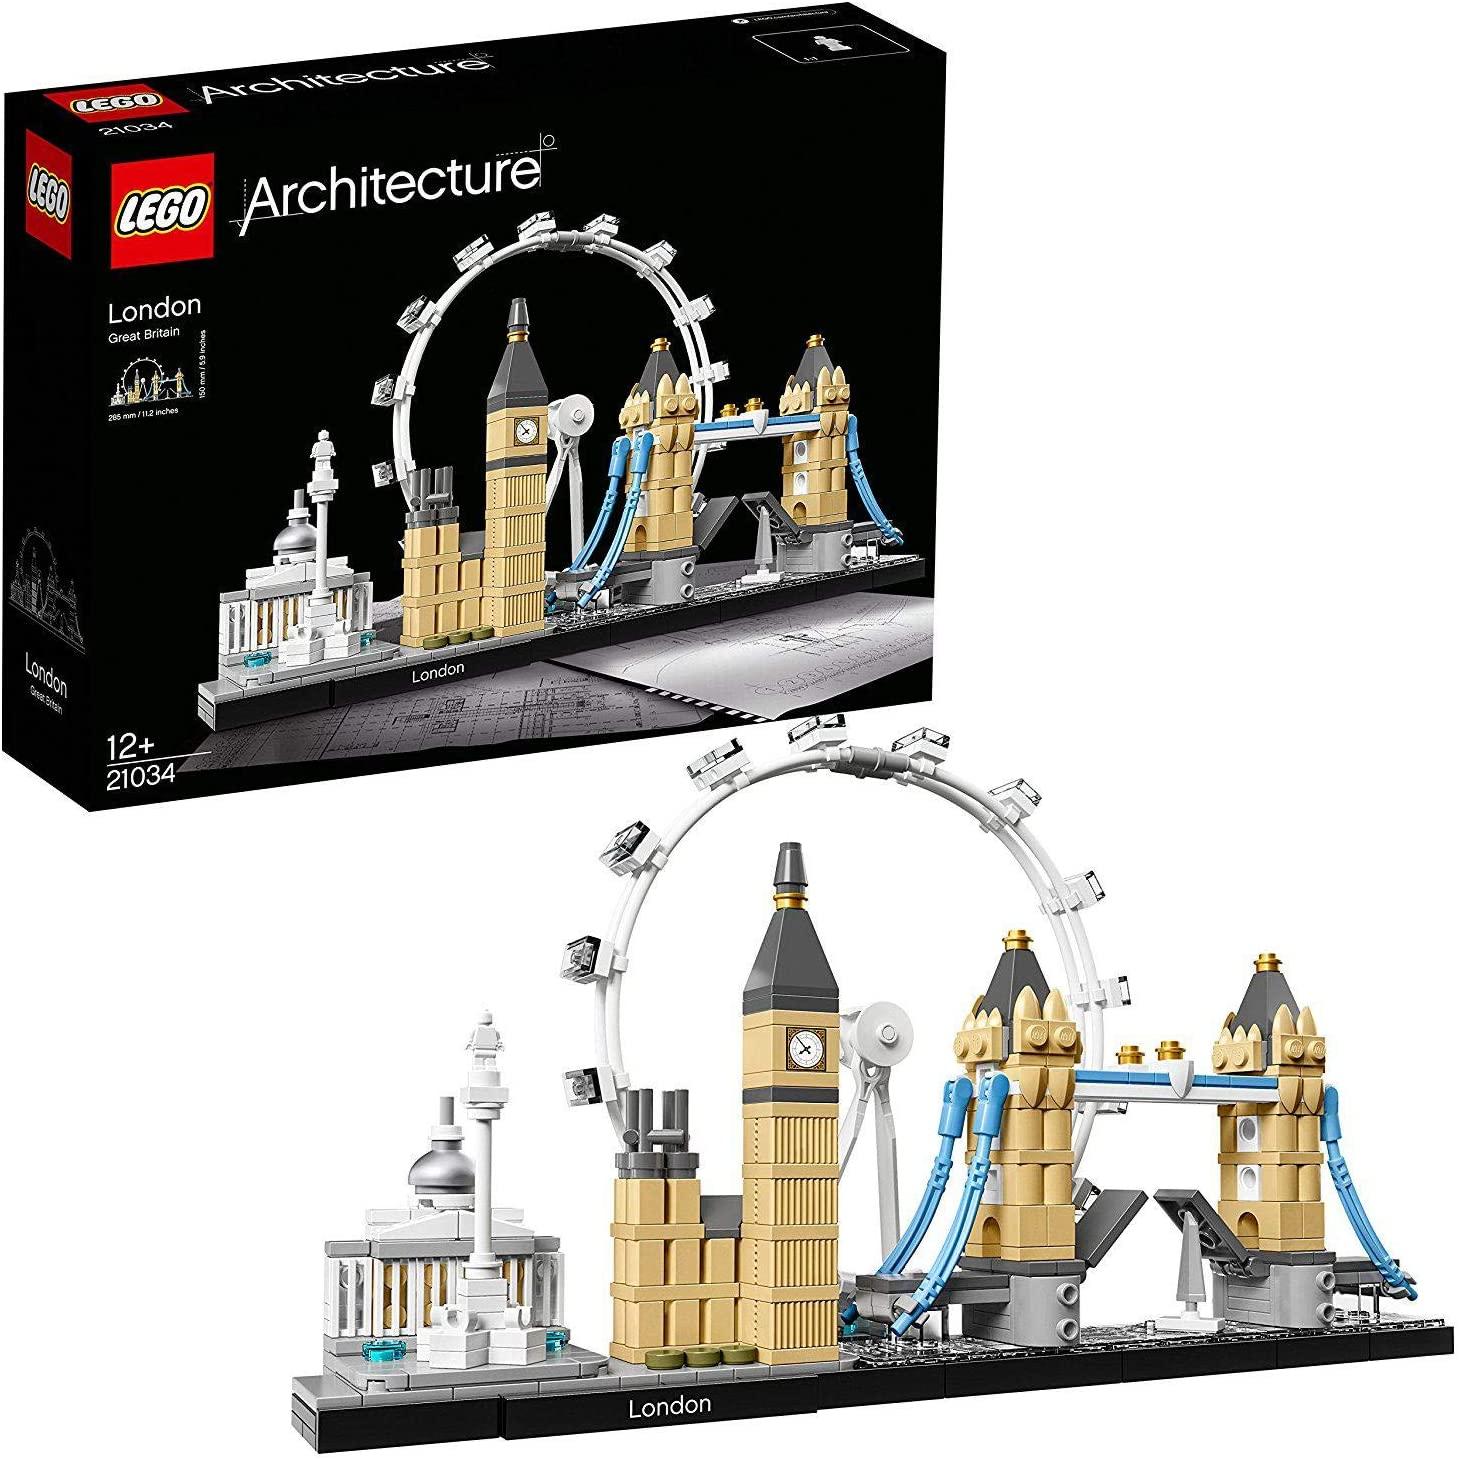 Lego Architecture London Set solo 33€